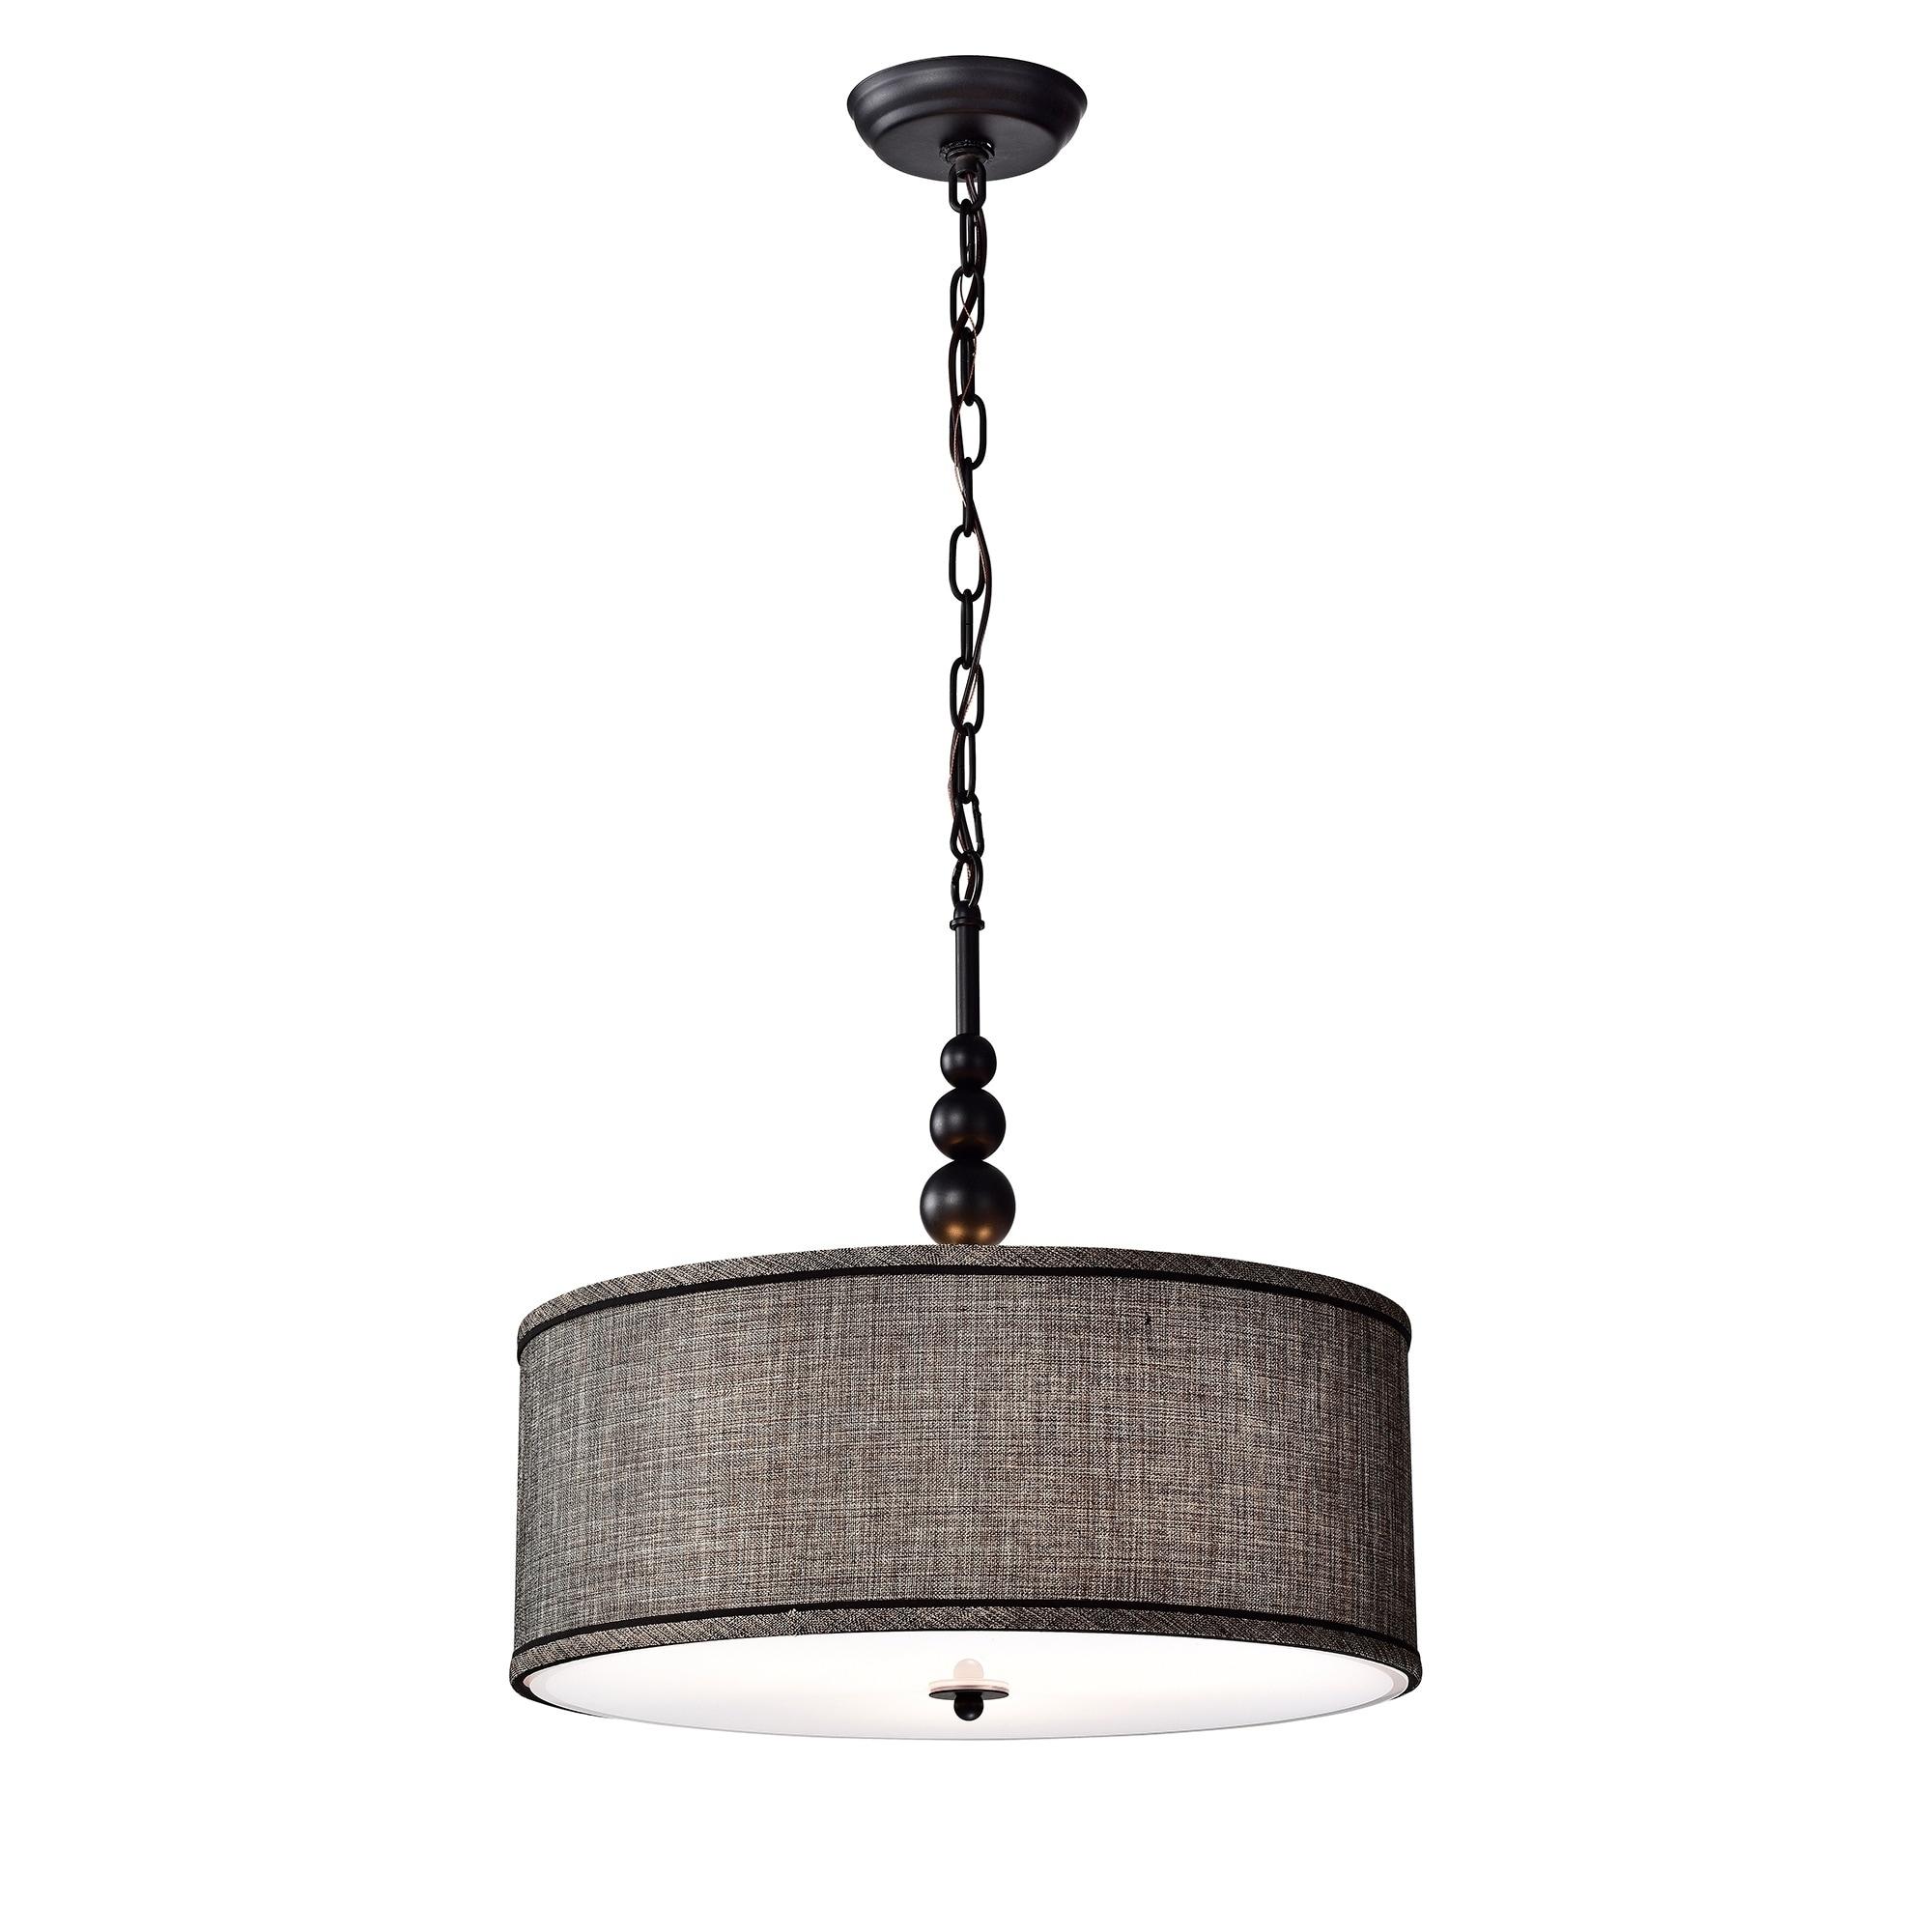 Penelope Woven Black 18 Inch Drum Pendant Lamp On Sale Overstock 25686453